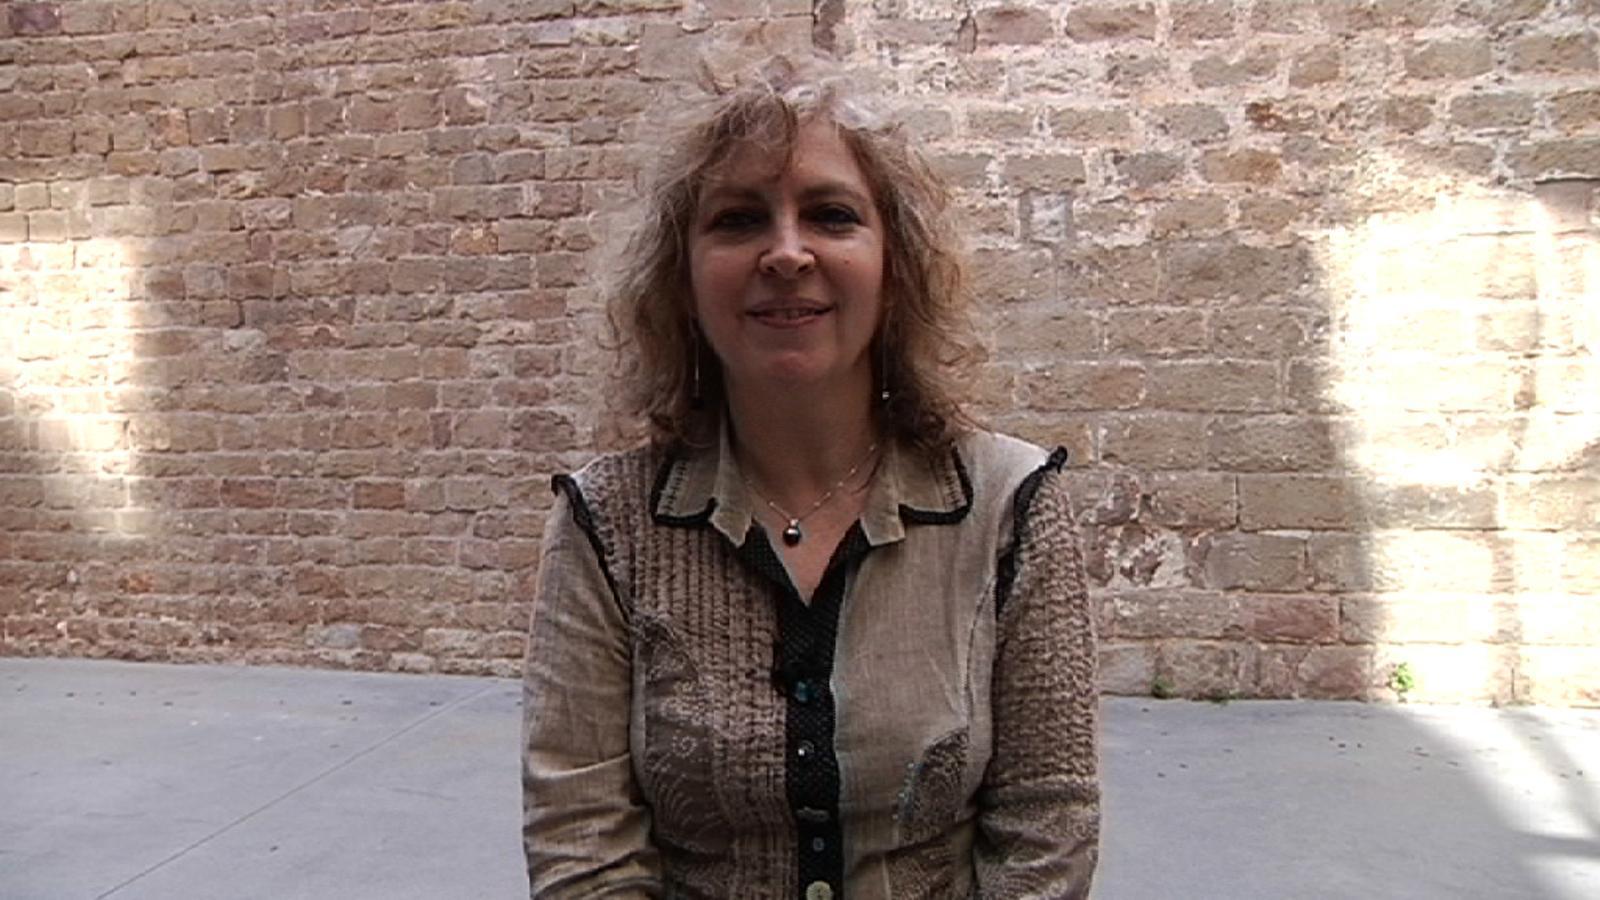 'L'enigma de Colom', de Maria Carme Roca